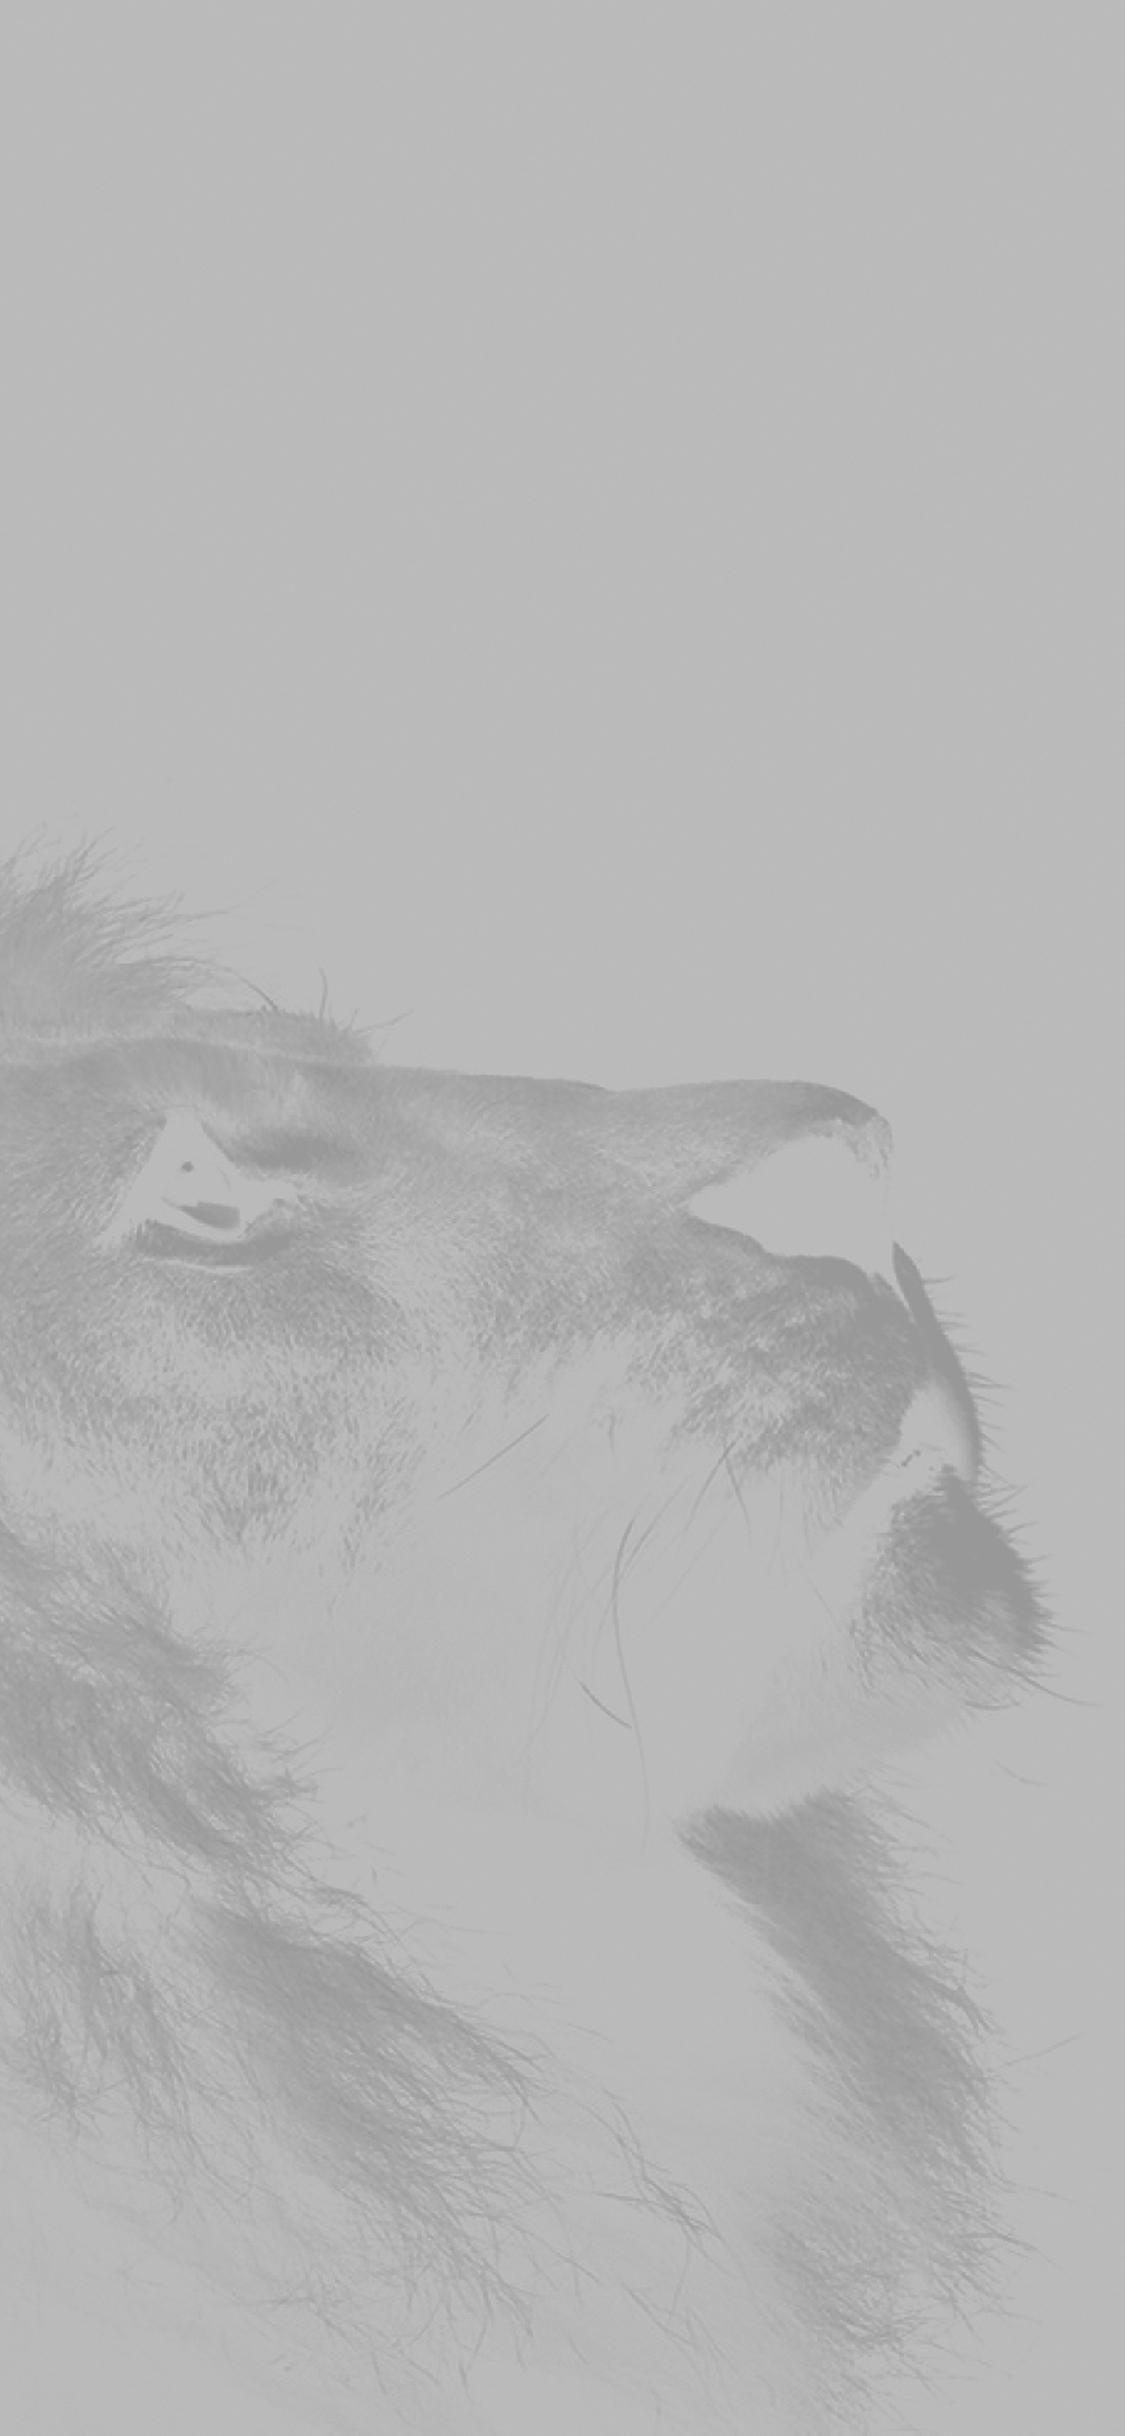 Iphonexpapers Com Iphone X Wallpaper Mj51 Lion Looking